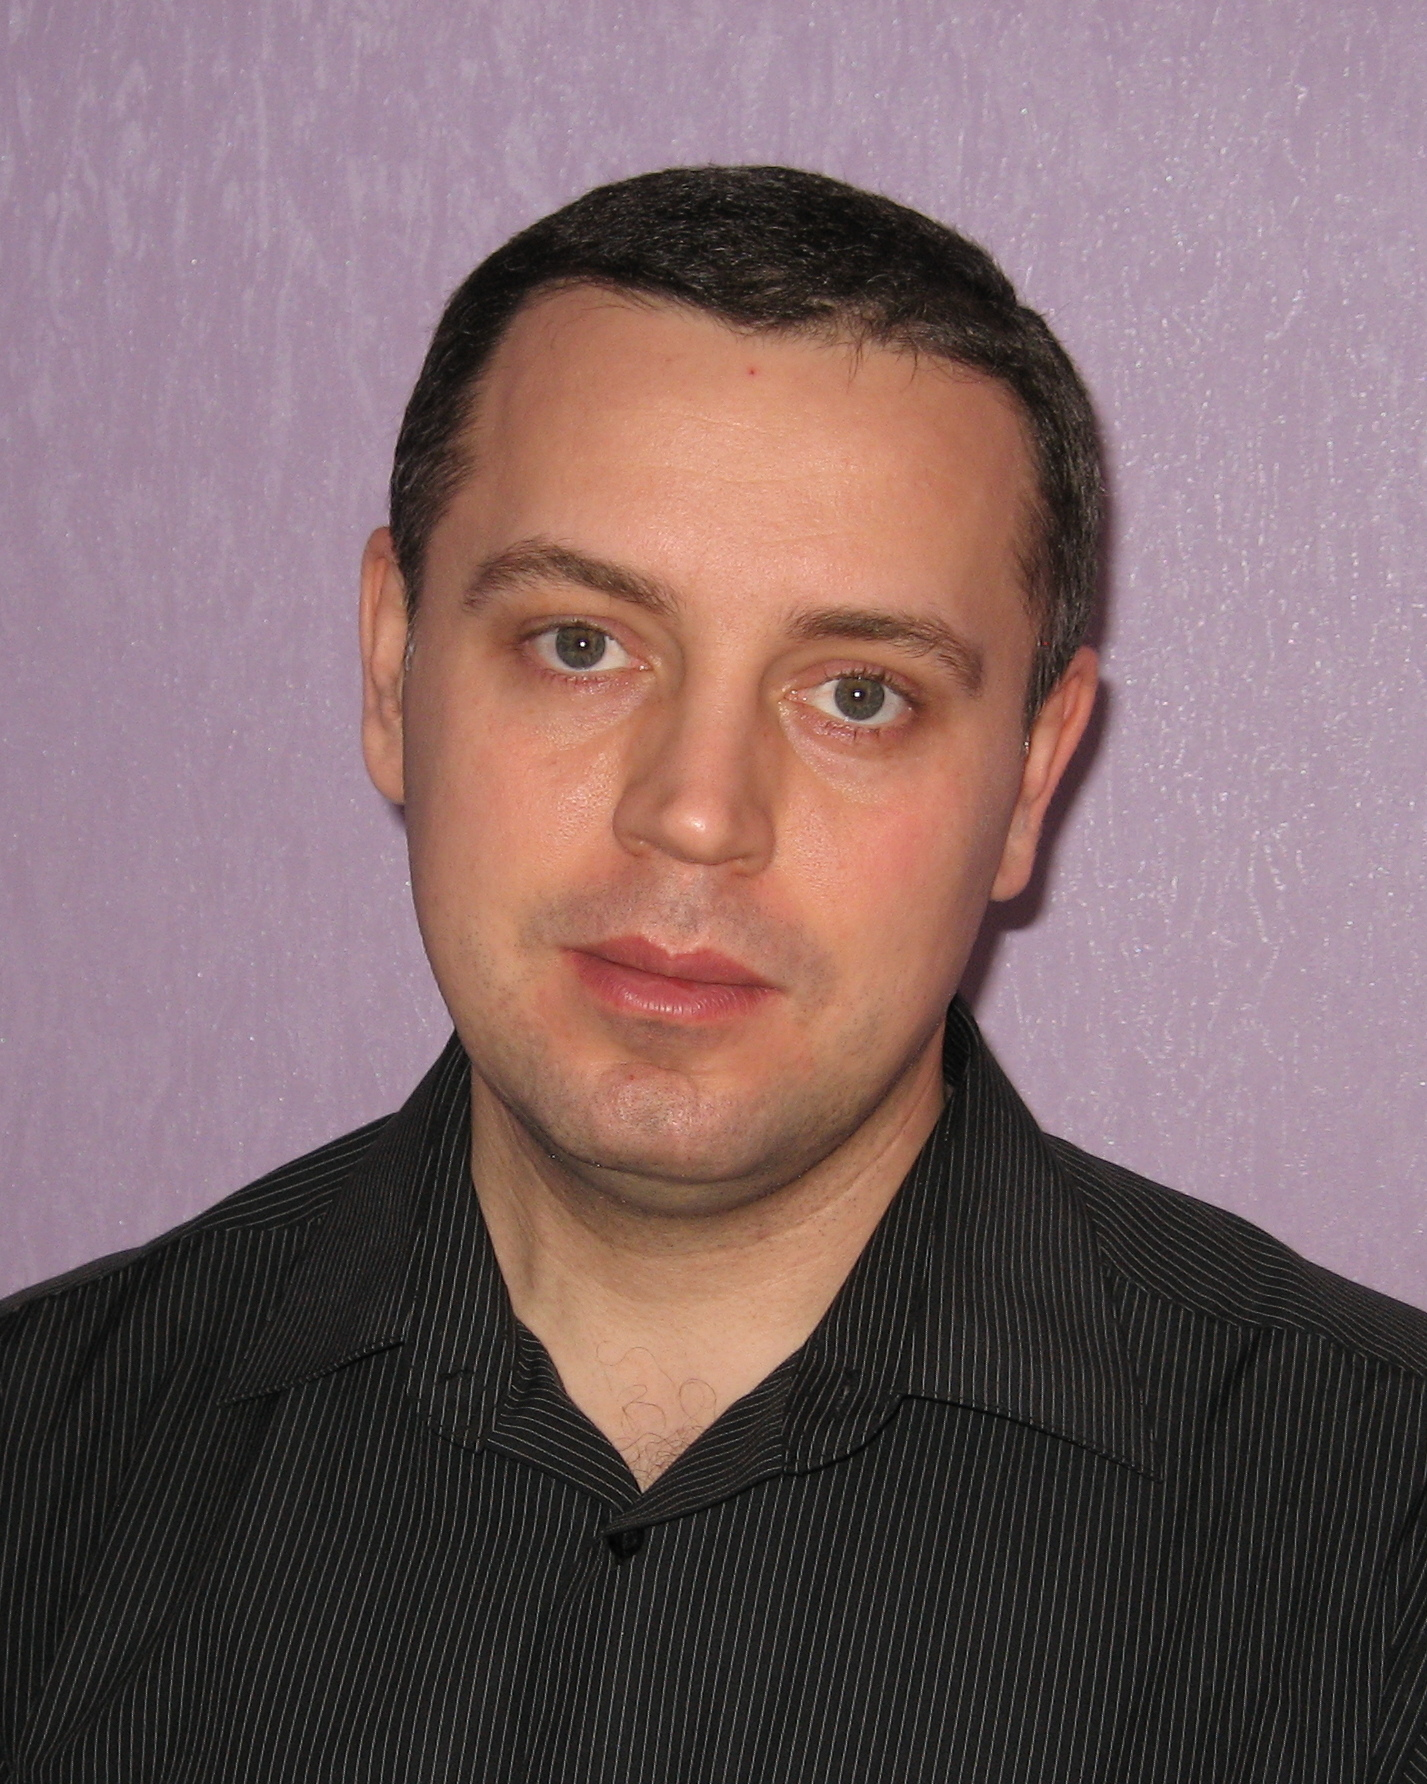 Панасенко Євген Валерійович